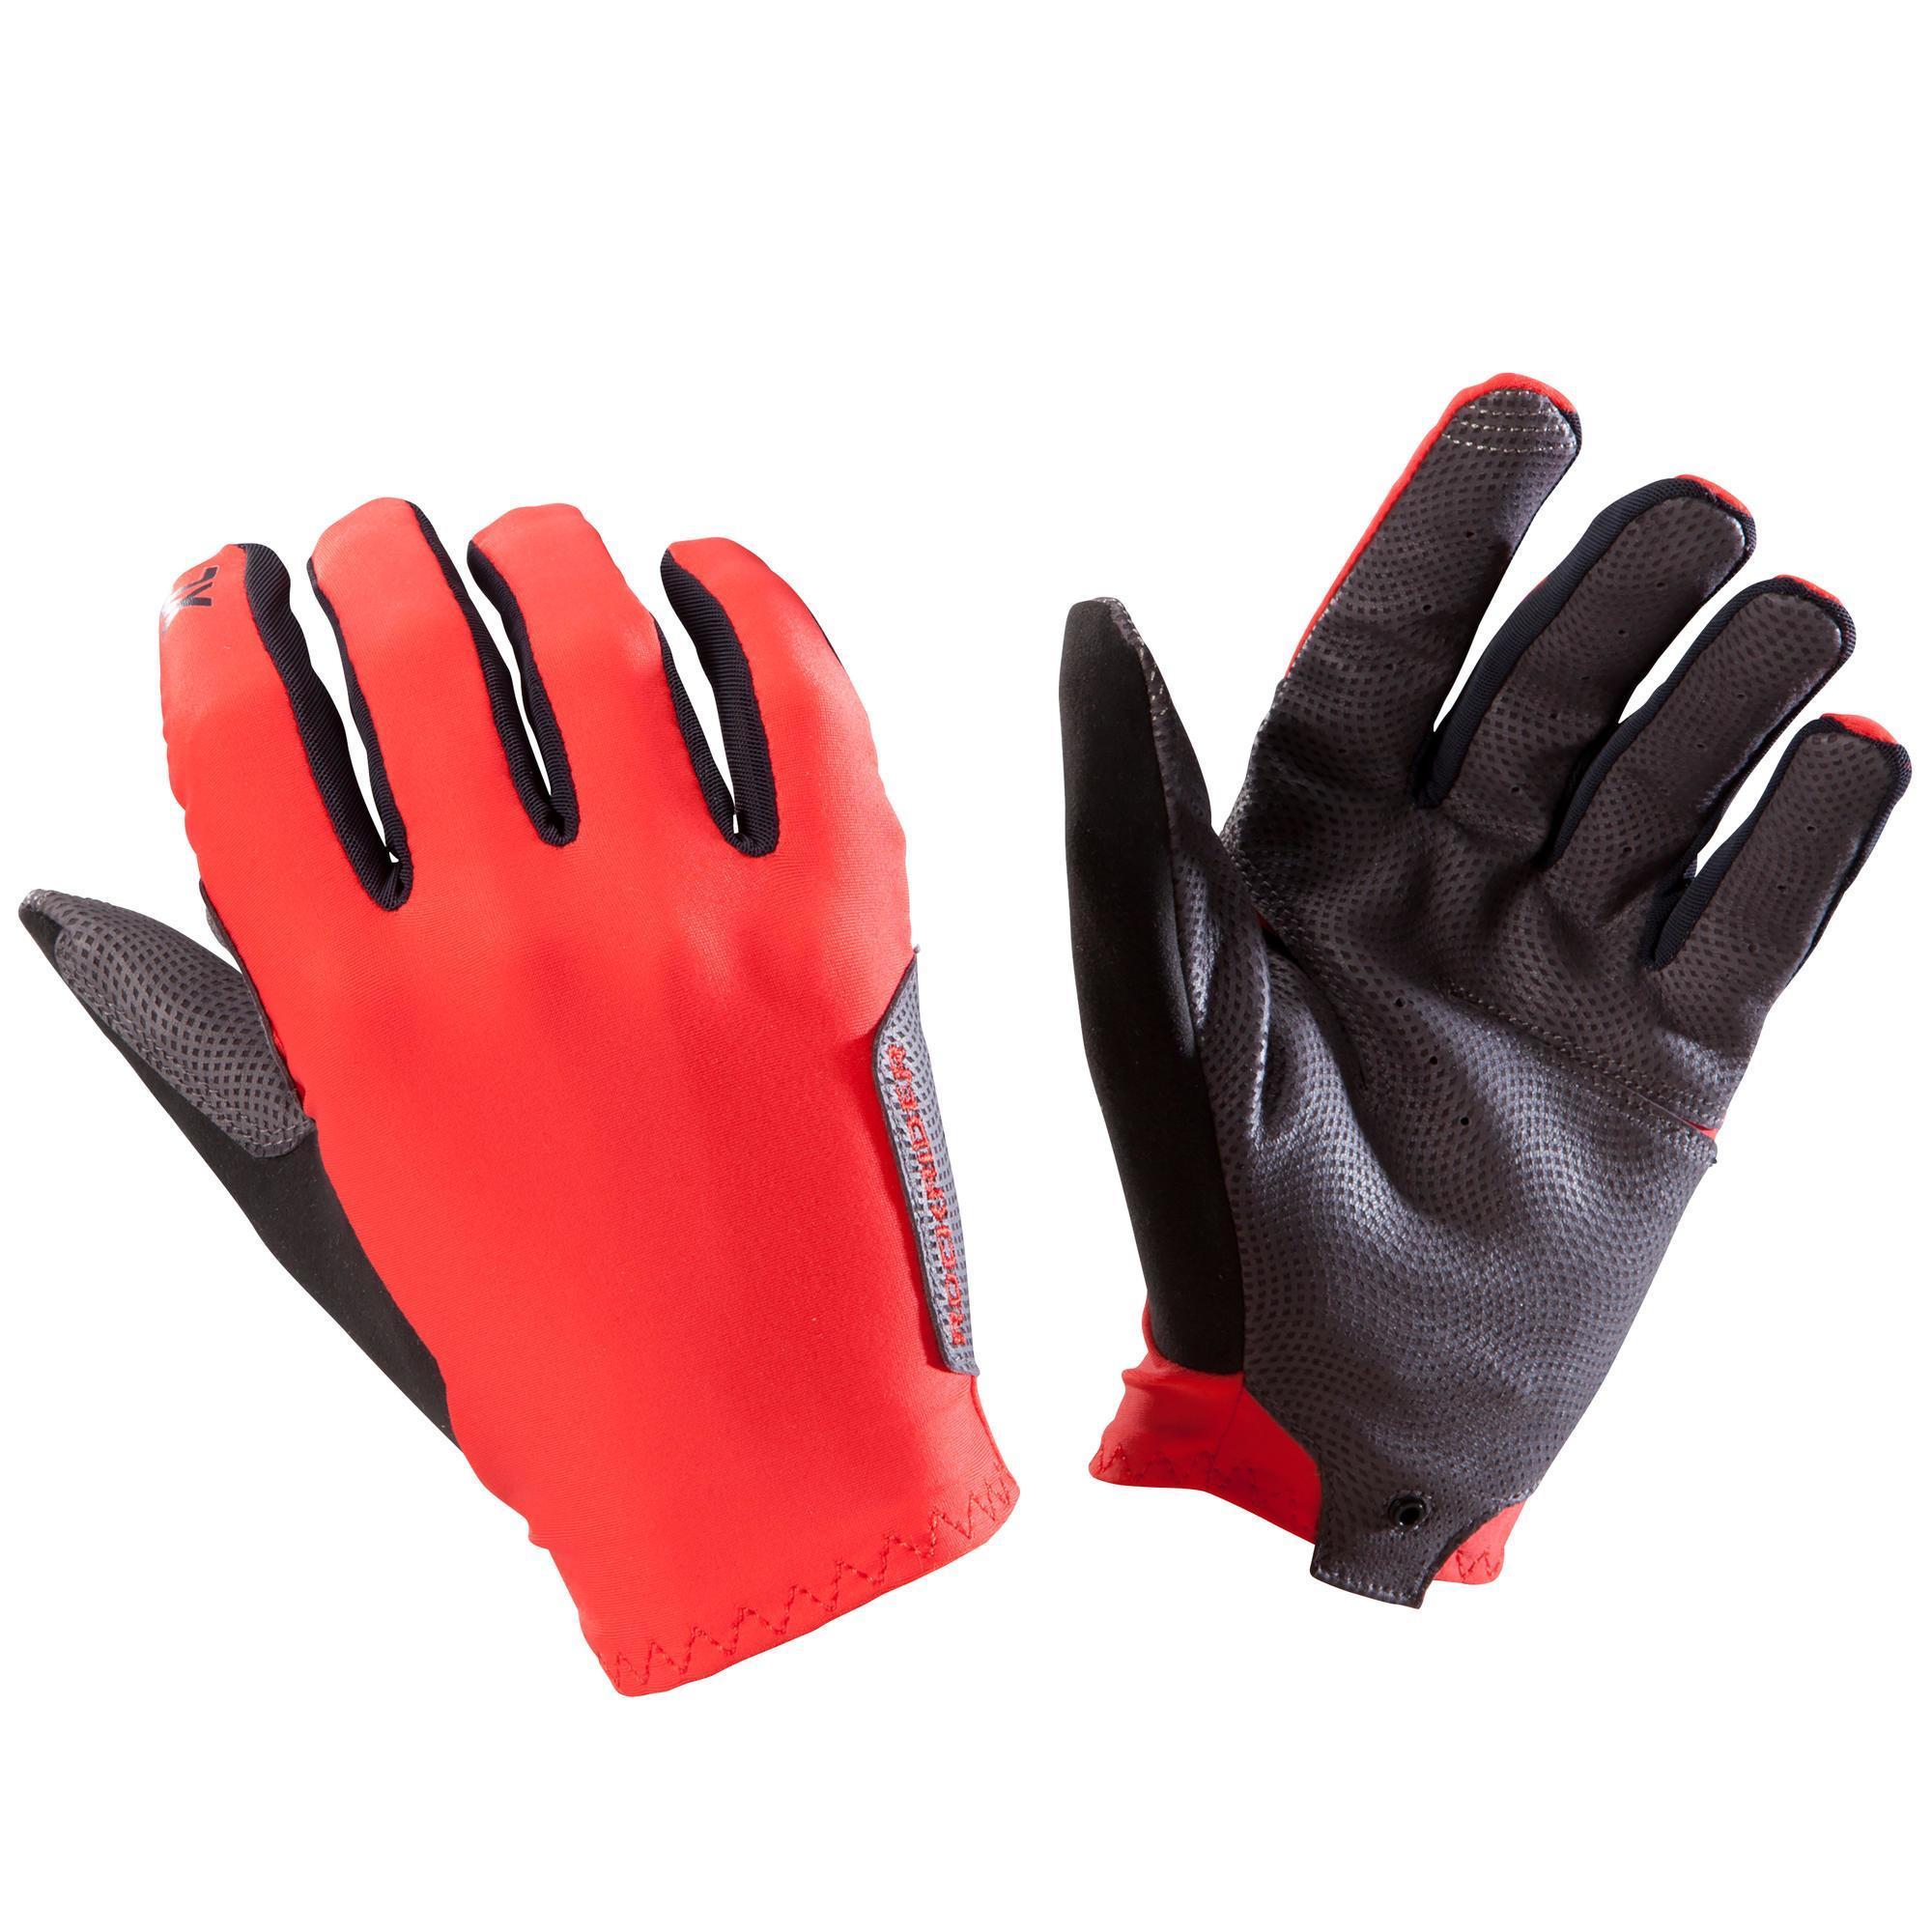 Fahrradhandschuhe MTB XC Light rot | Accessoires > Handschuhe | Rot | Baumwolle - Stein | Rockrider